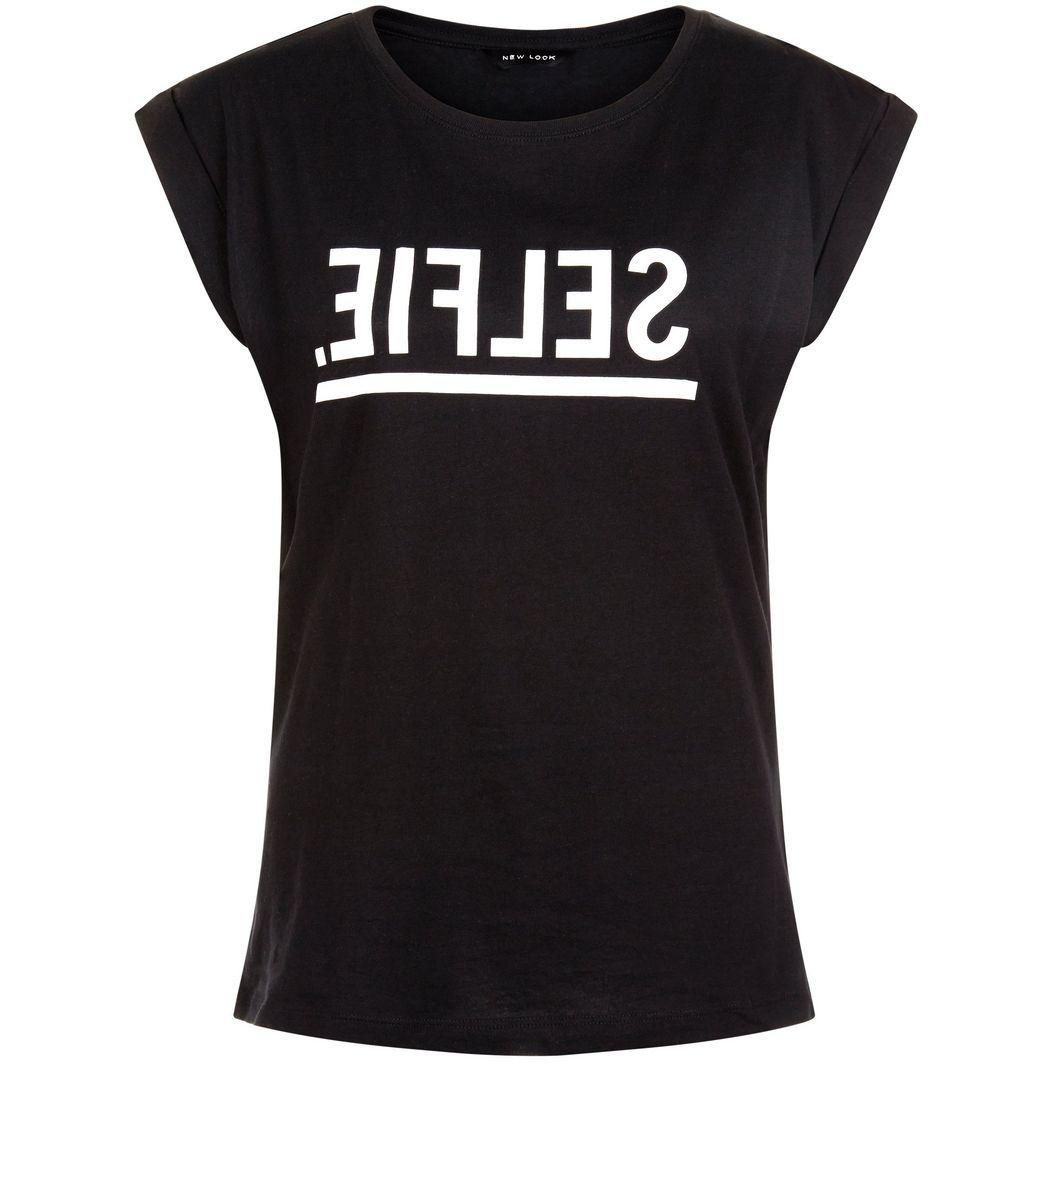 Black Selfie Mirror Slogan T-Shirt    New Look